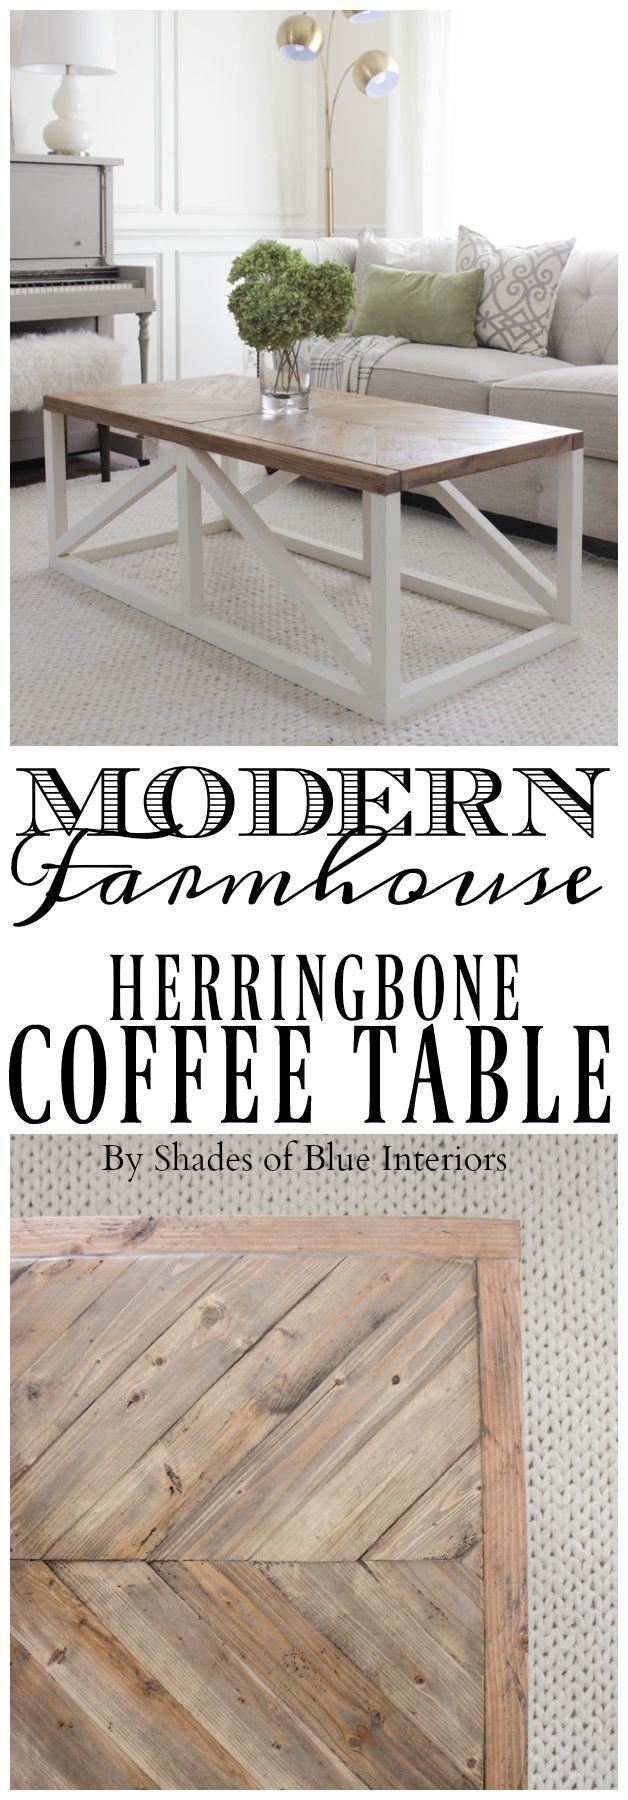 Modern Farmhouse Herringbone Coffee Table